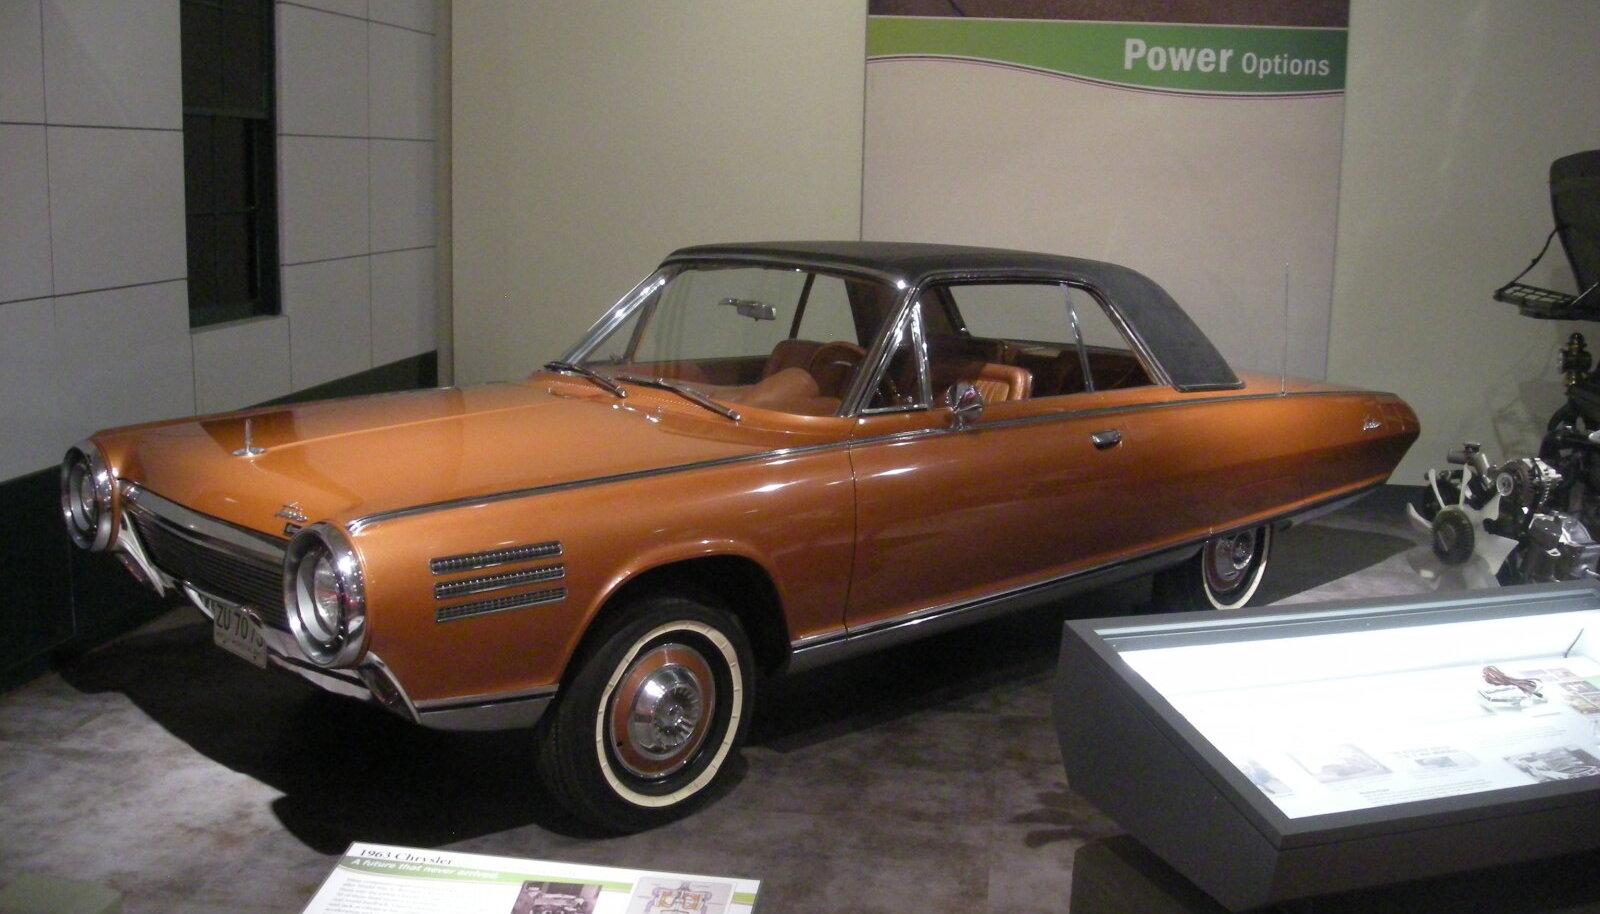 Chrysler Gas Turbine